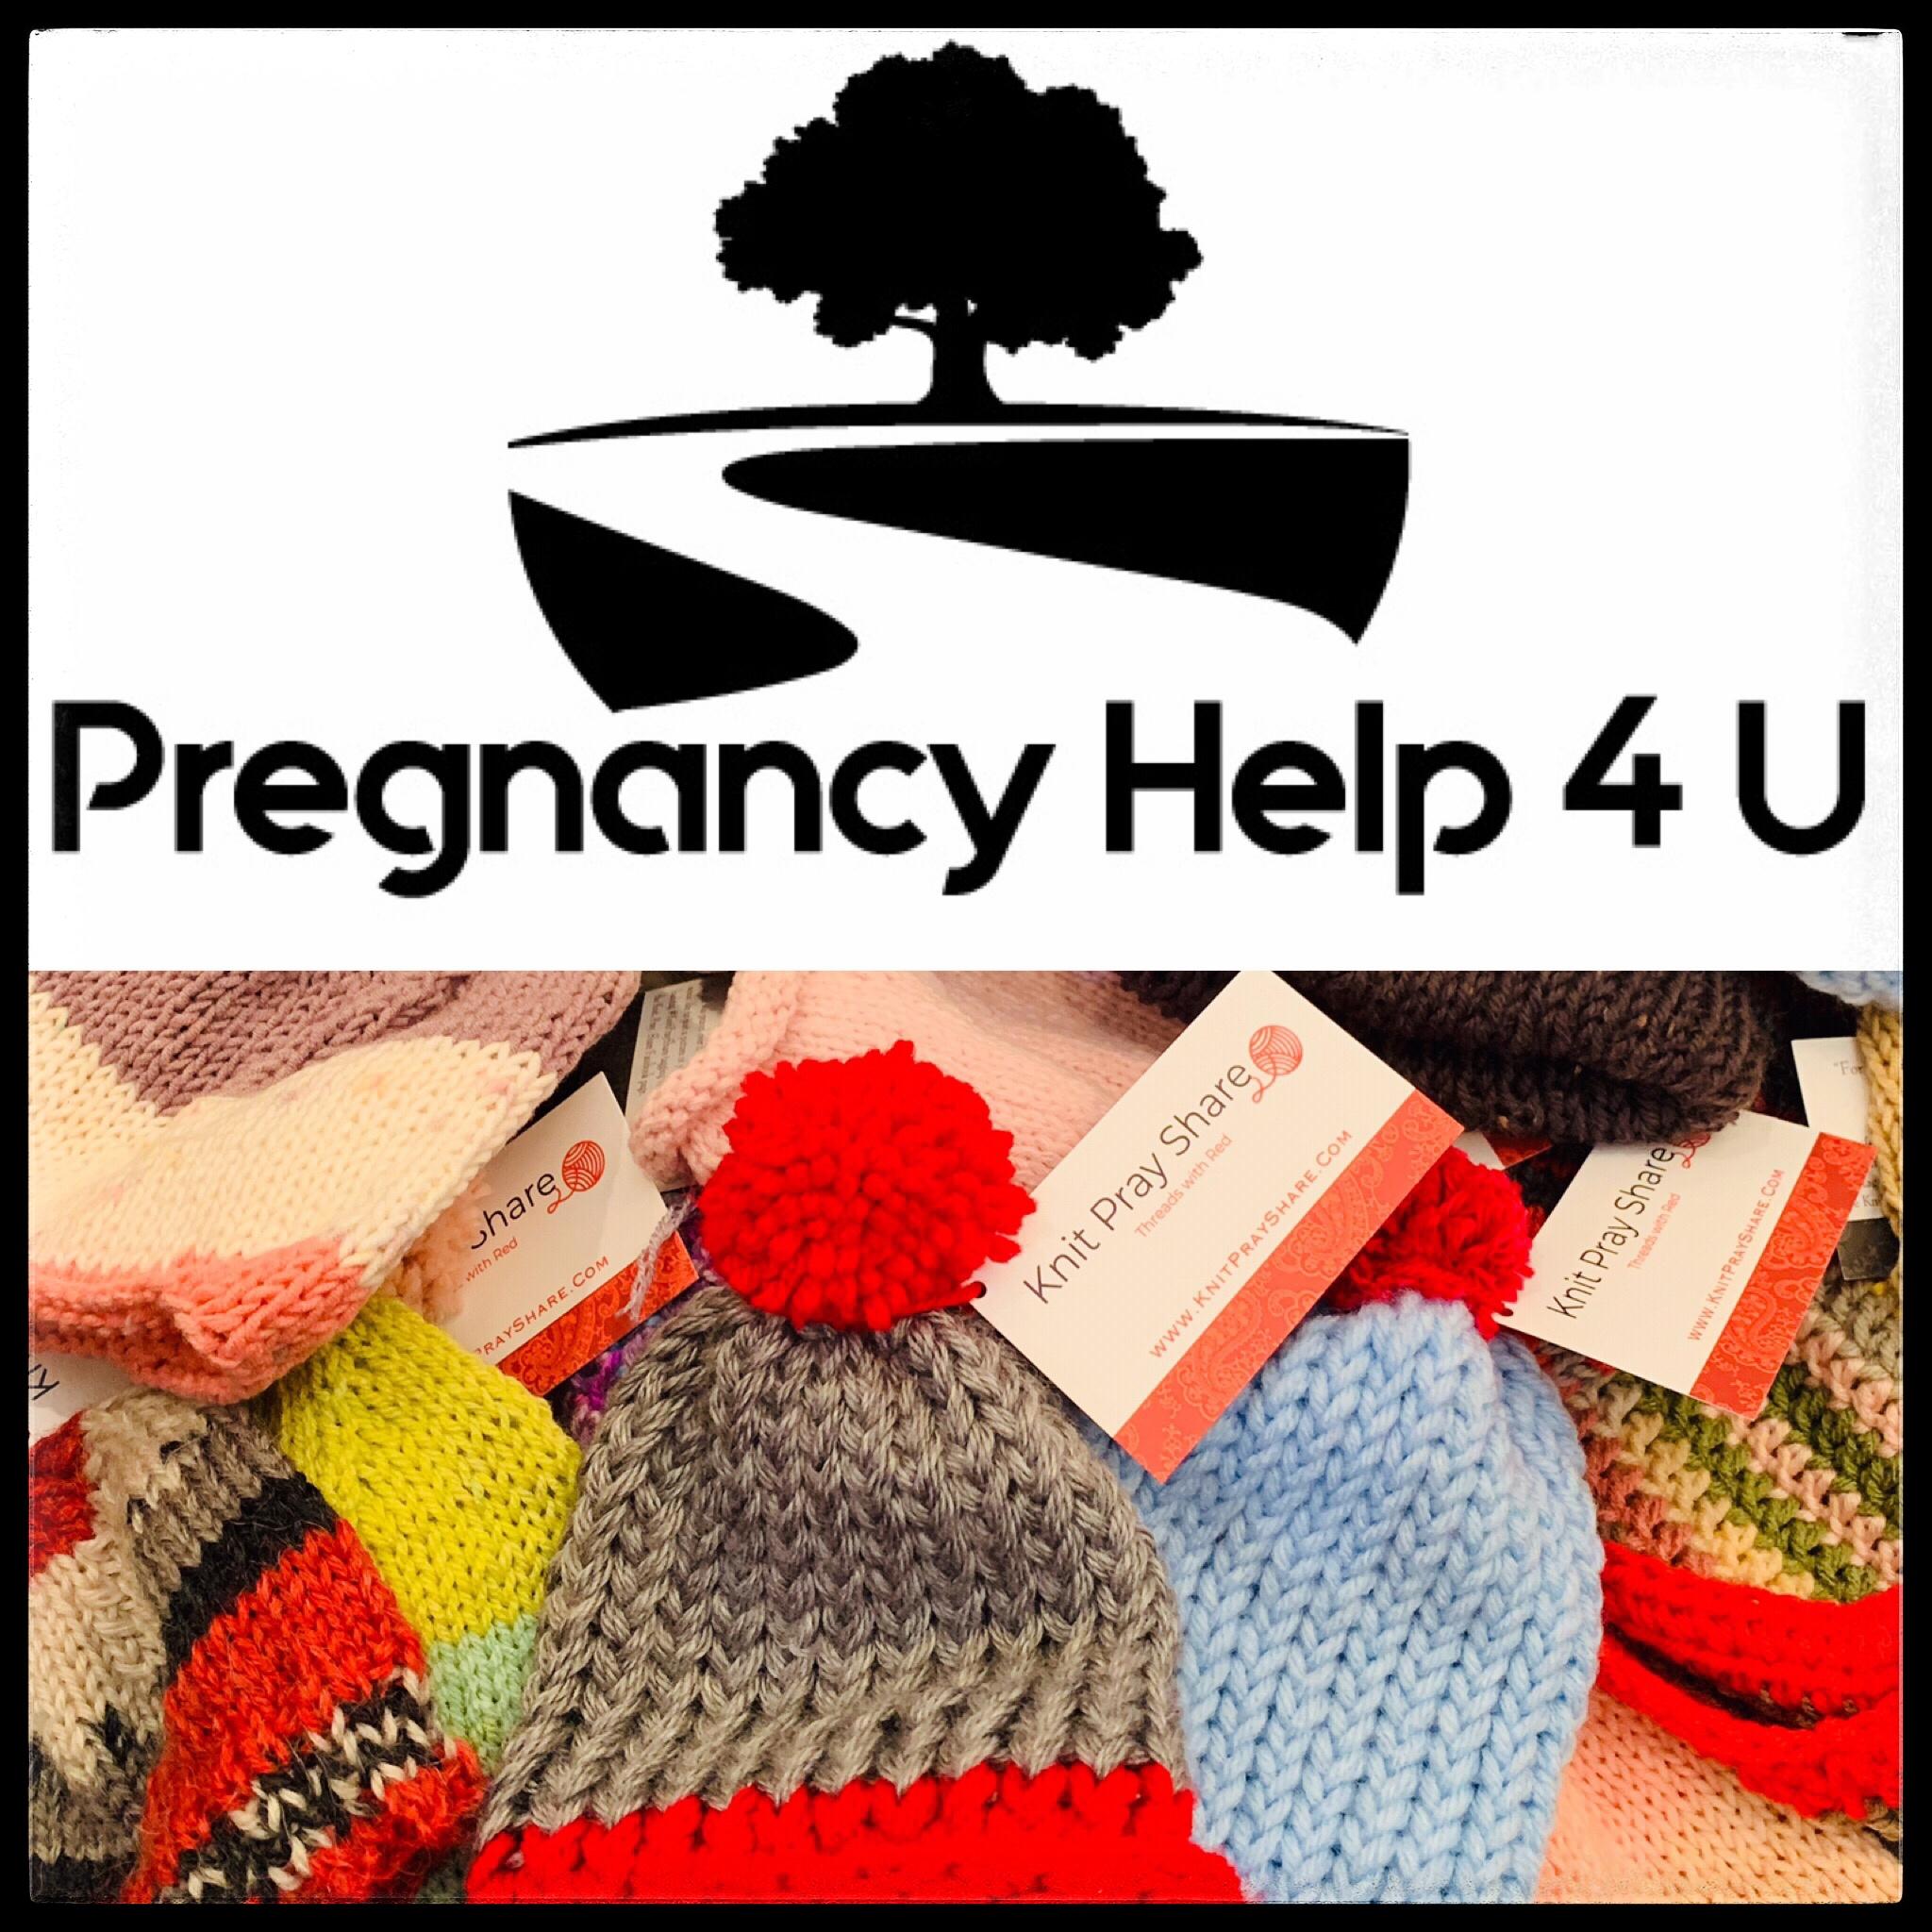 pregnancyhelp4ublog.jpg